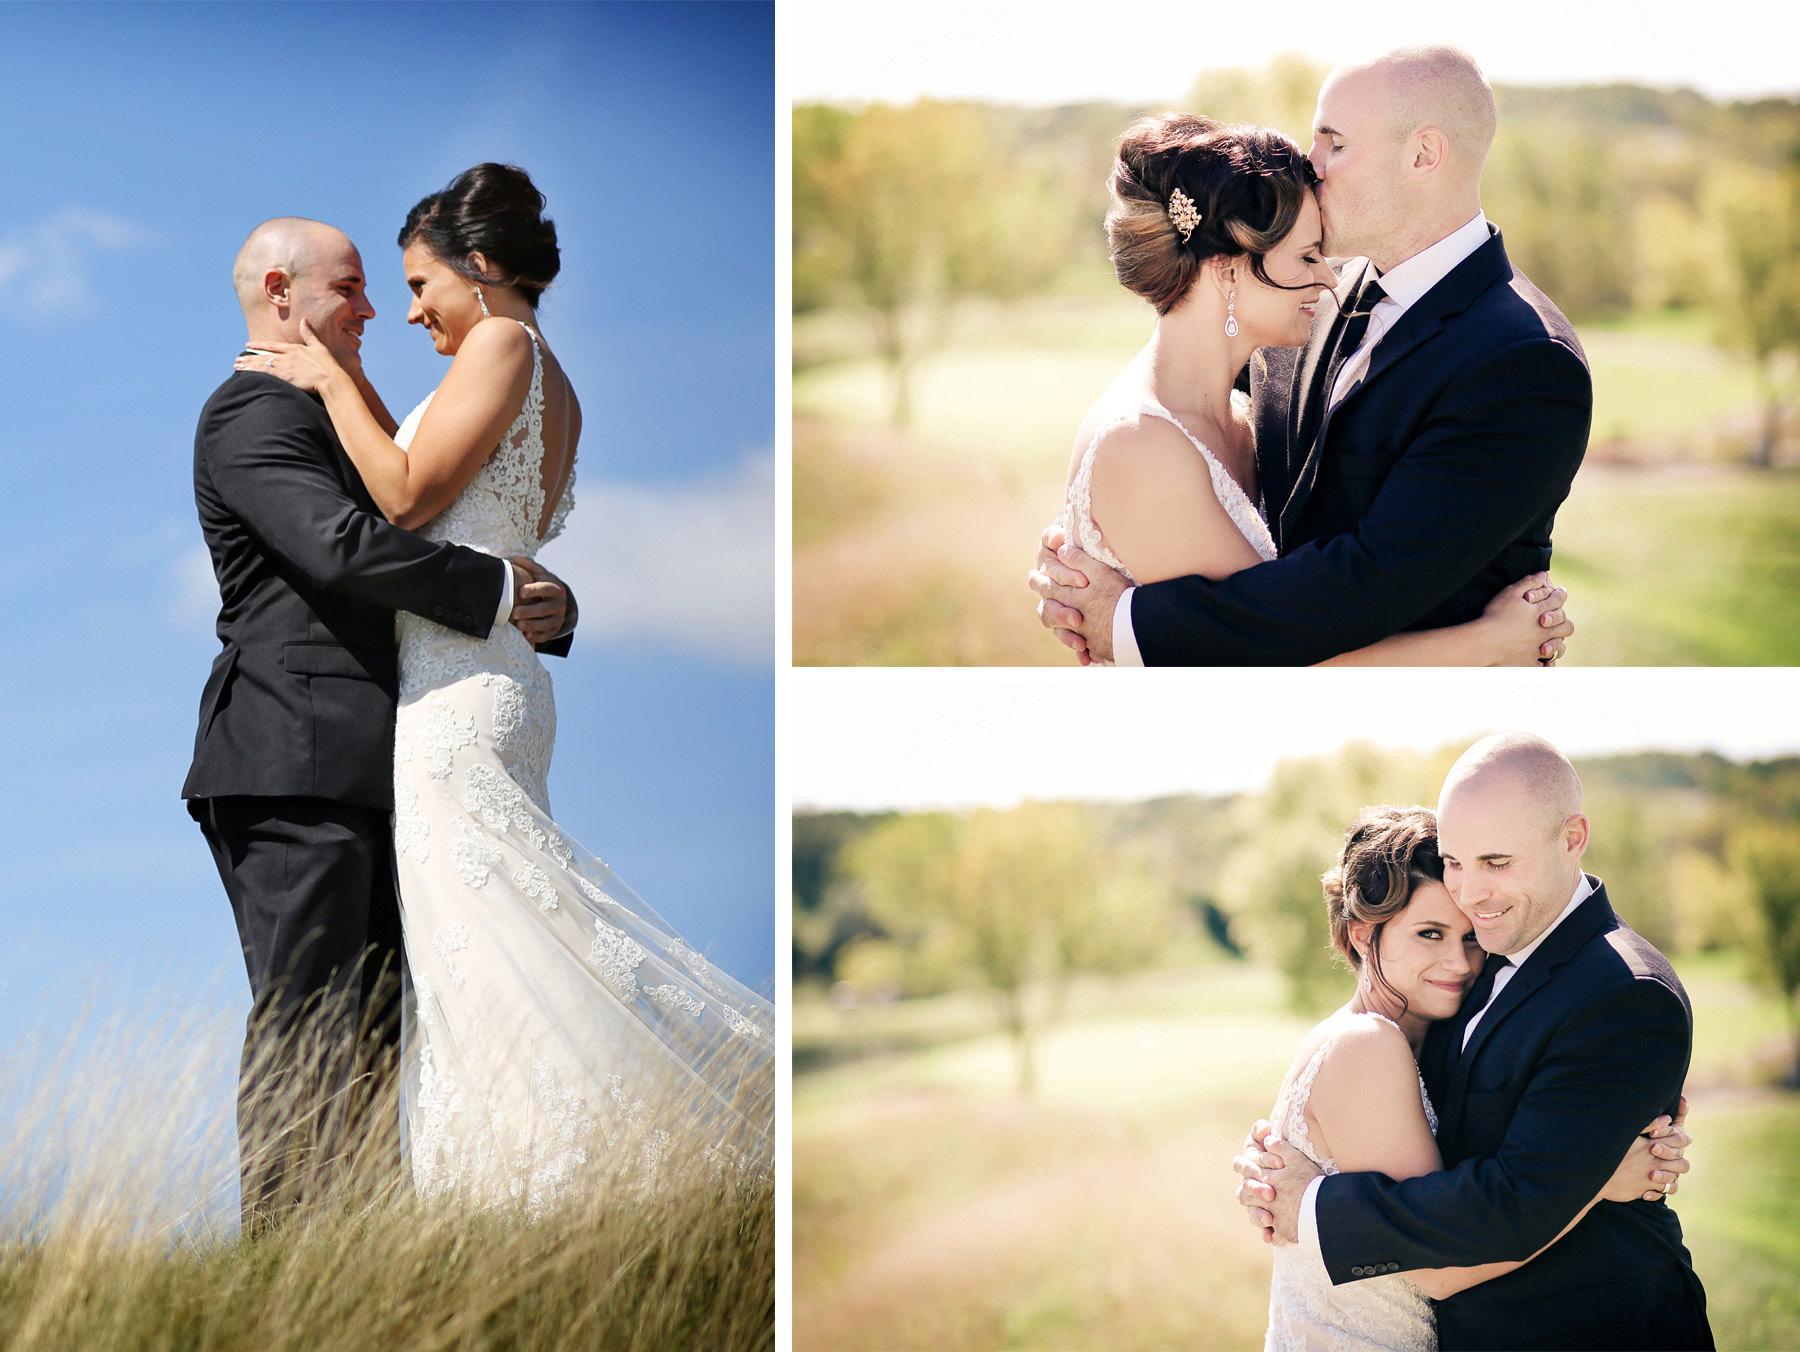 09-Stillwater-Minnesota-Wedding-Photography-by-Vick-Photography-First-Look-Blue-Sky-Tara-&-Ryan.jpg